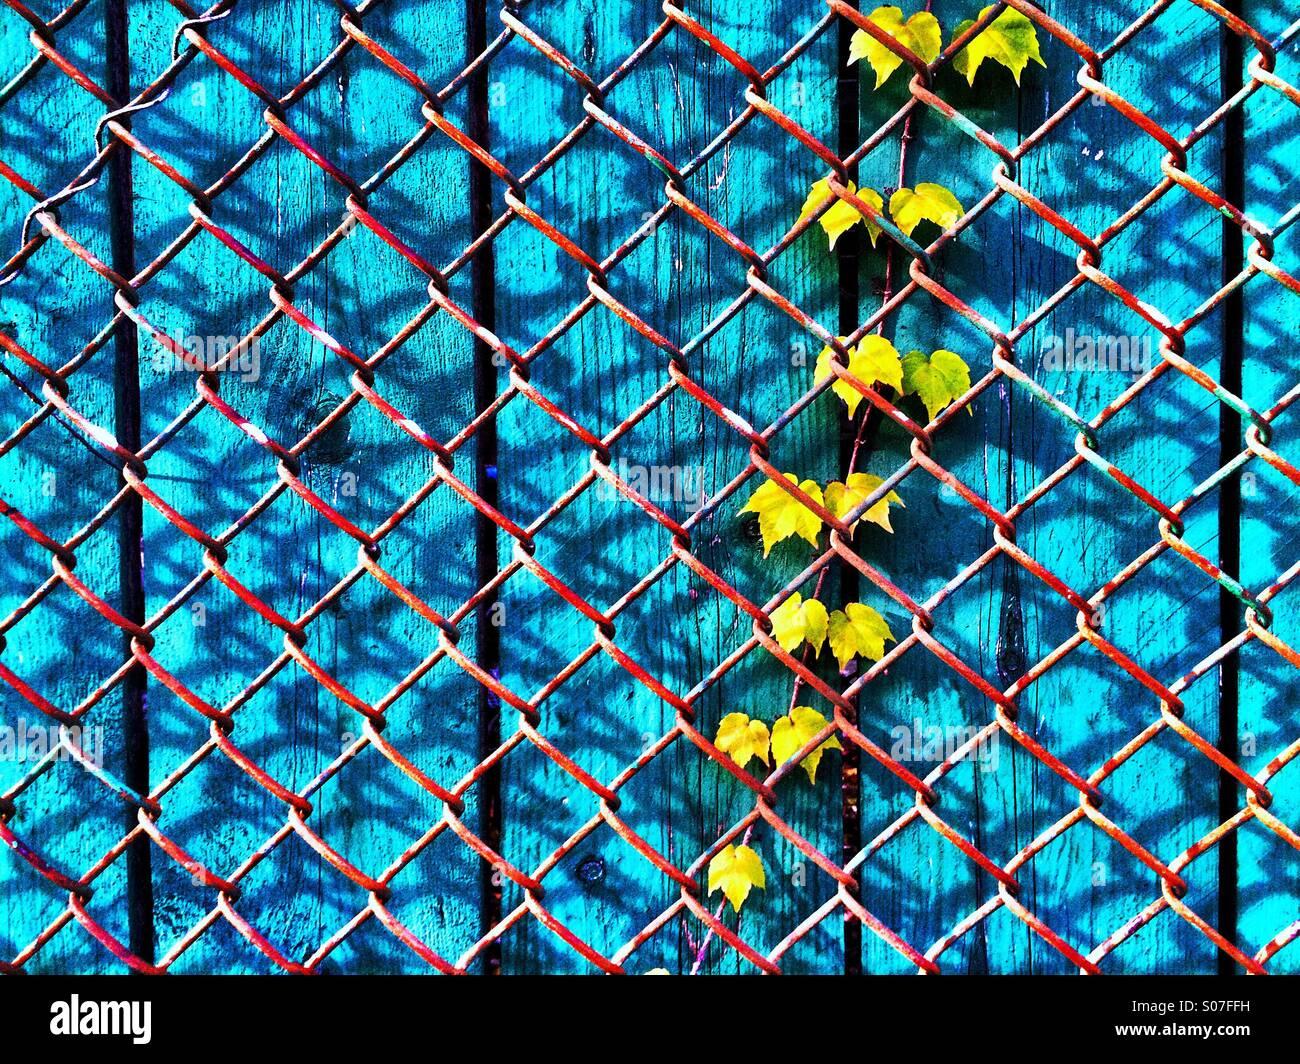 Wire Vine Stock Photos & Wire Vine Stock Images - Alamy